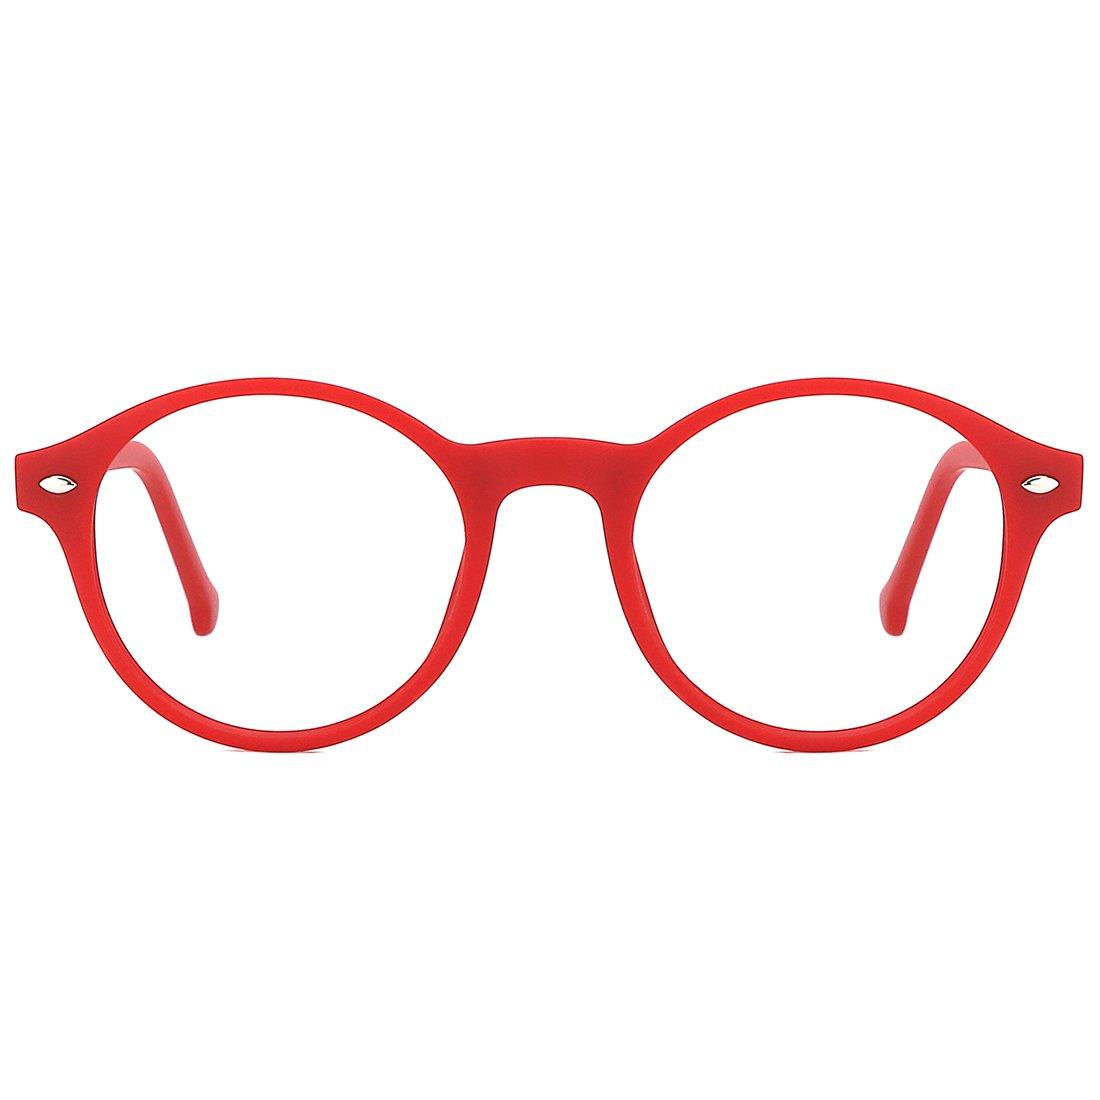 TIJN Men Women Classic Round Non-prescription Frosted Eyeglasses Frame 48) 00064201